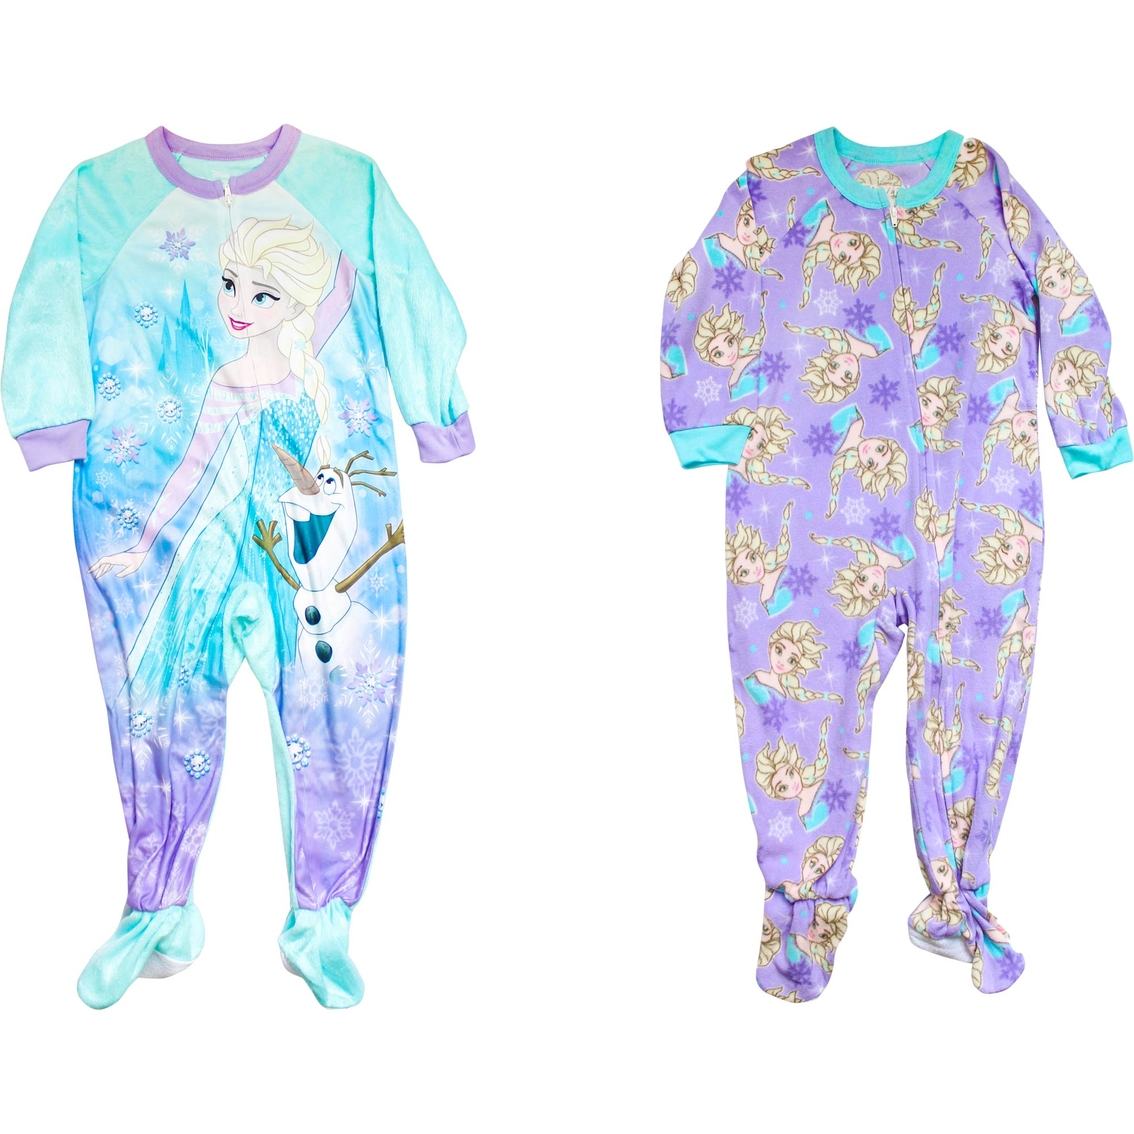 c9ce7252c Disney Toddler Girls Frozen Friendship Twofer Micro Fleece Blanket ...